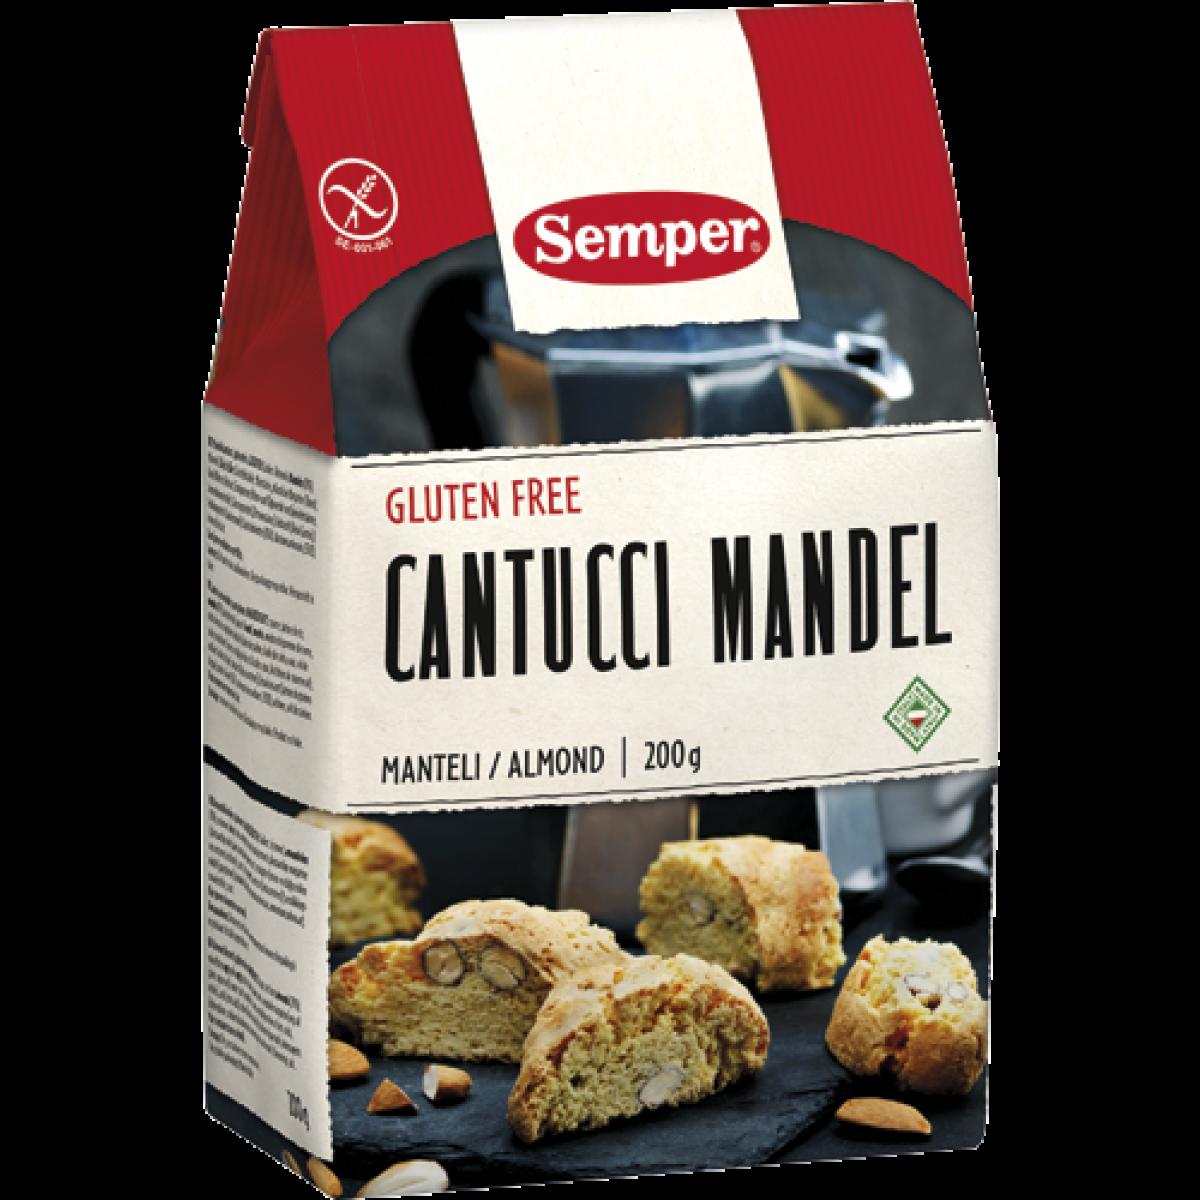 Cantucci Mandel